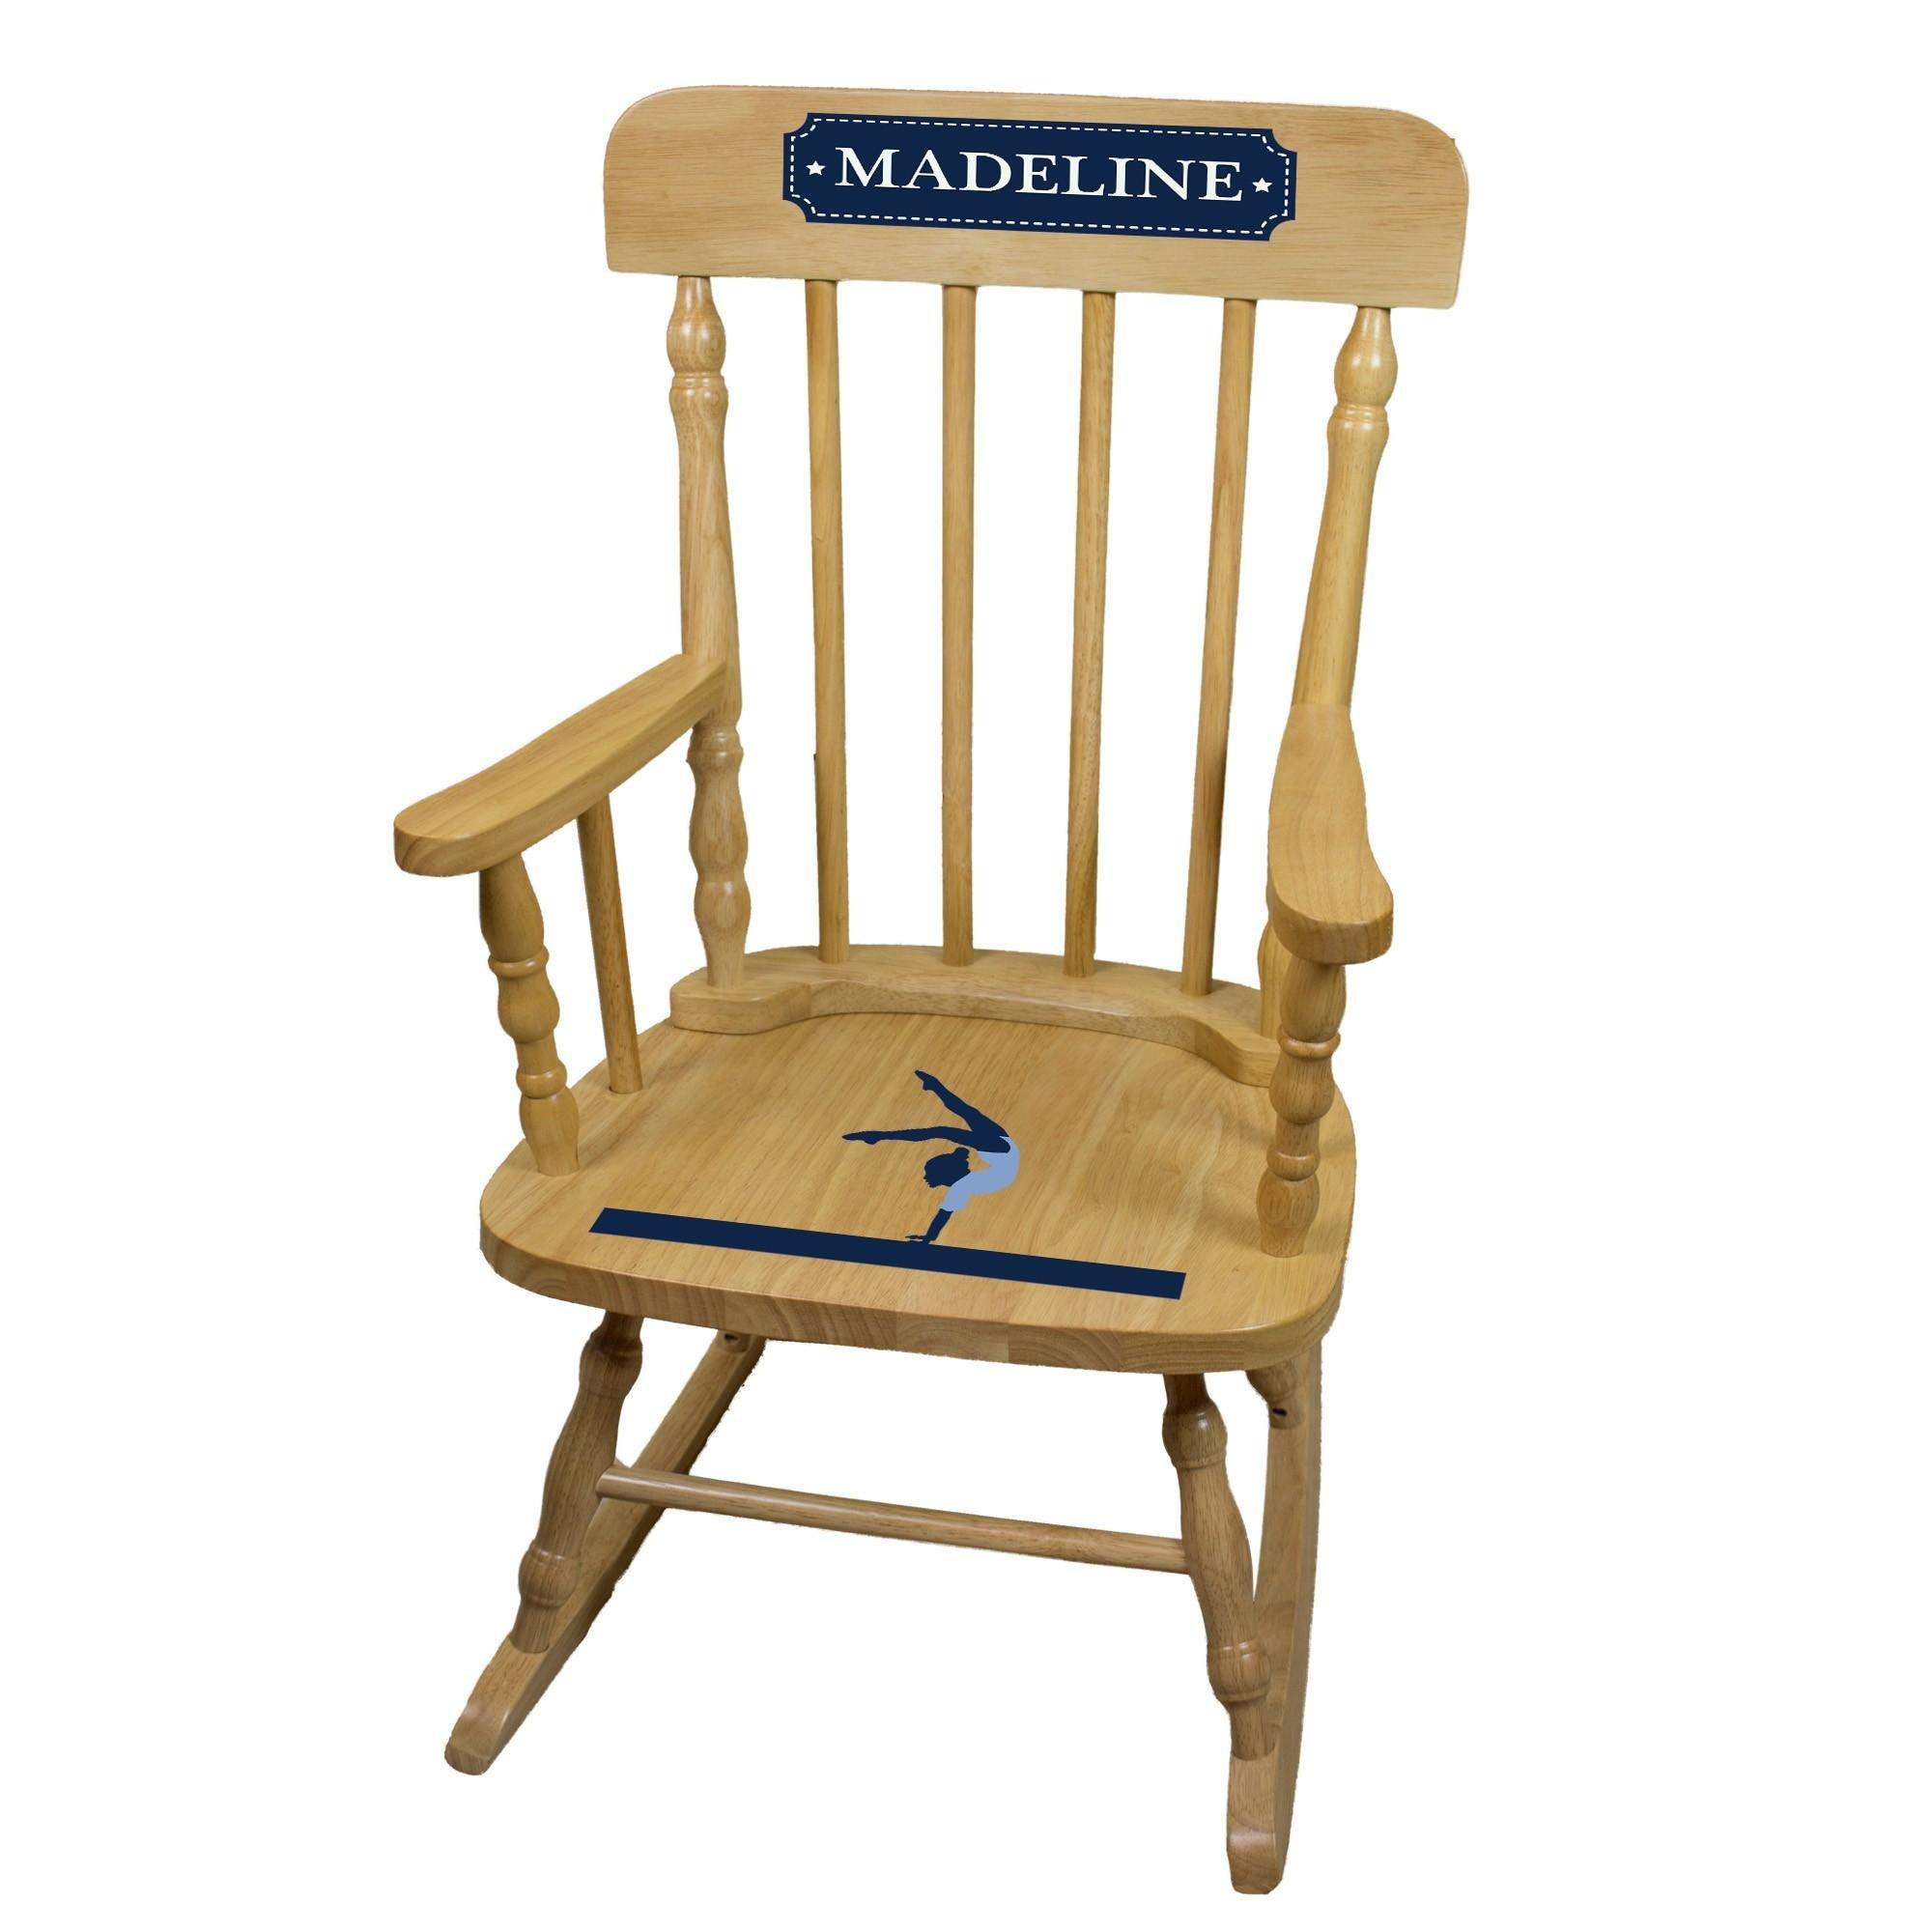 MyBambino Personalized Gymnastics Natural Wooden Childrens Rocking Chair